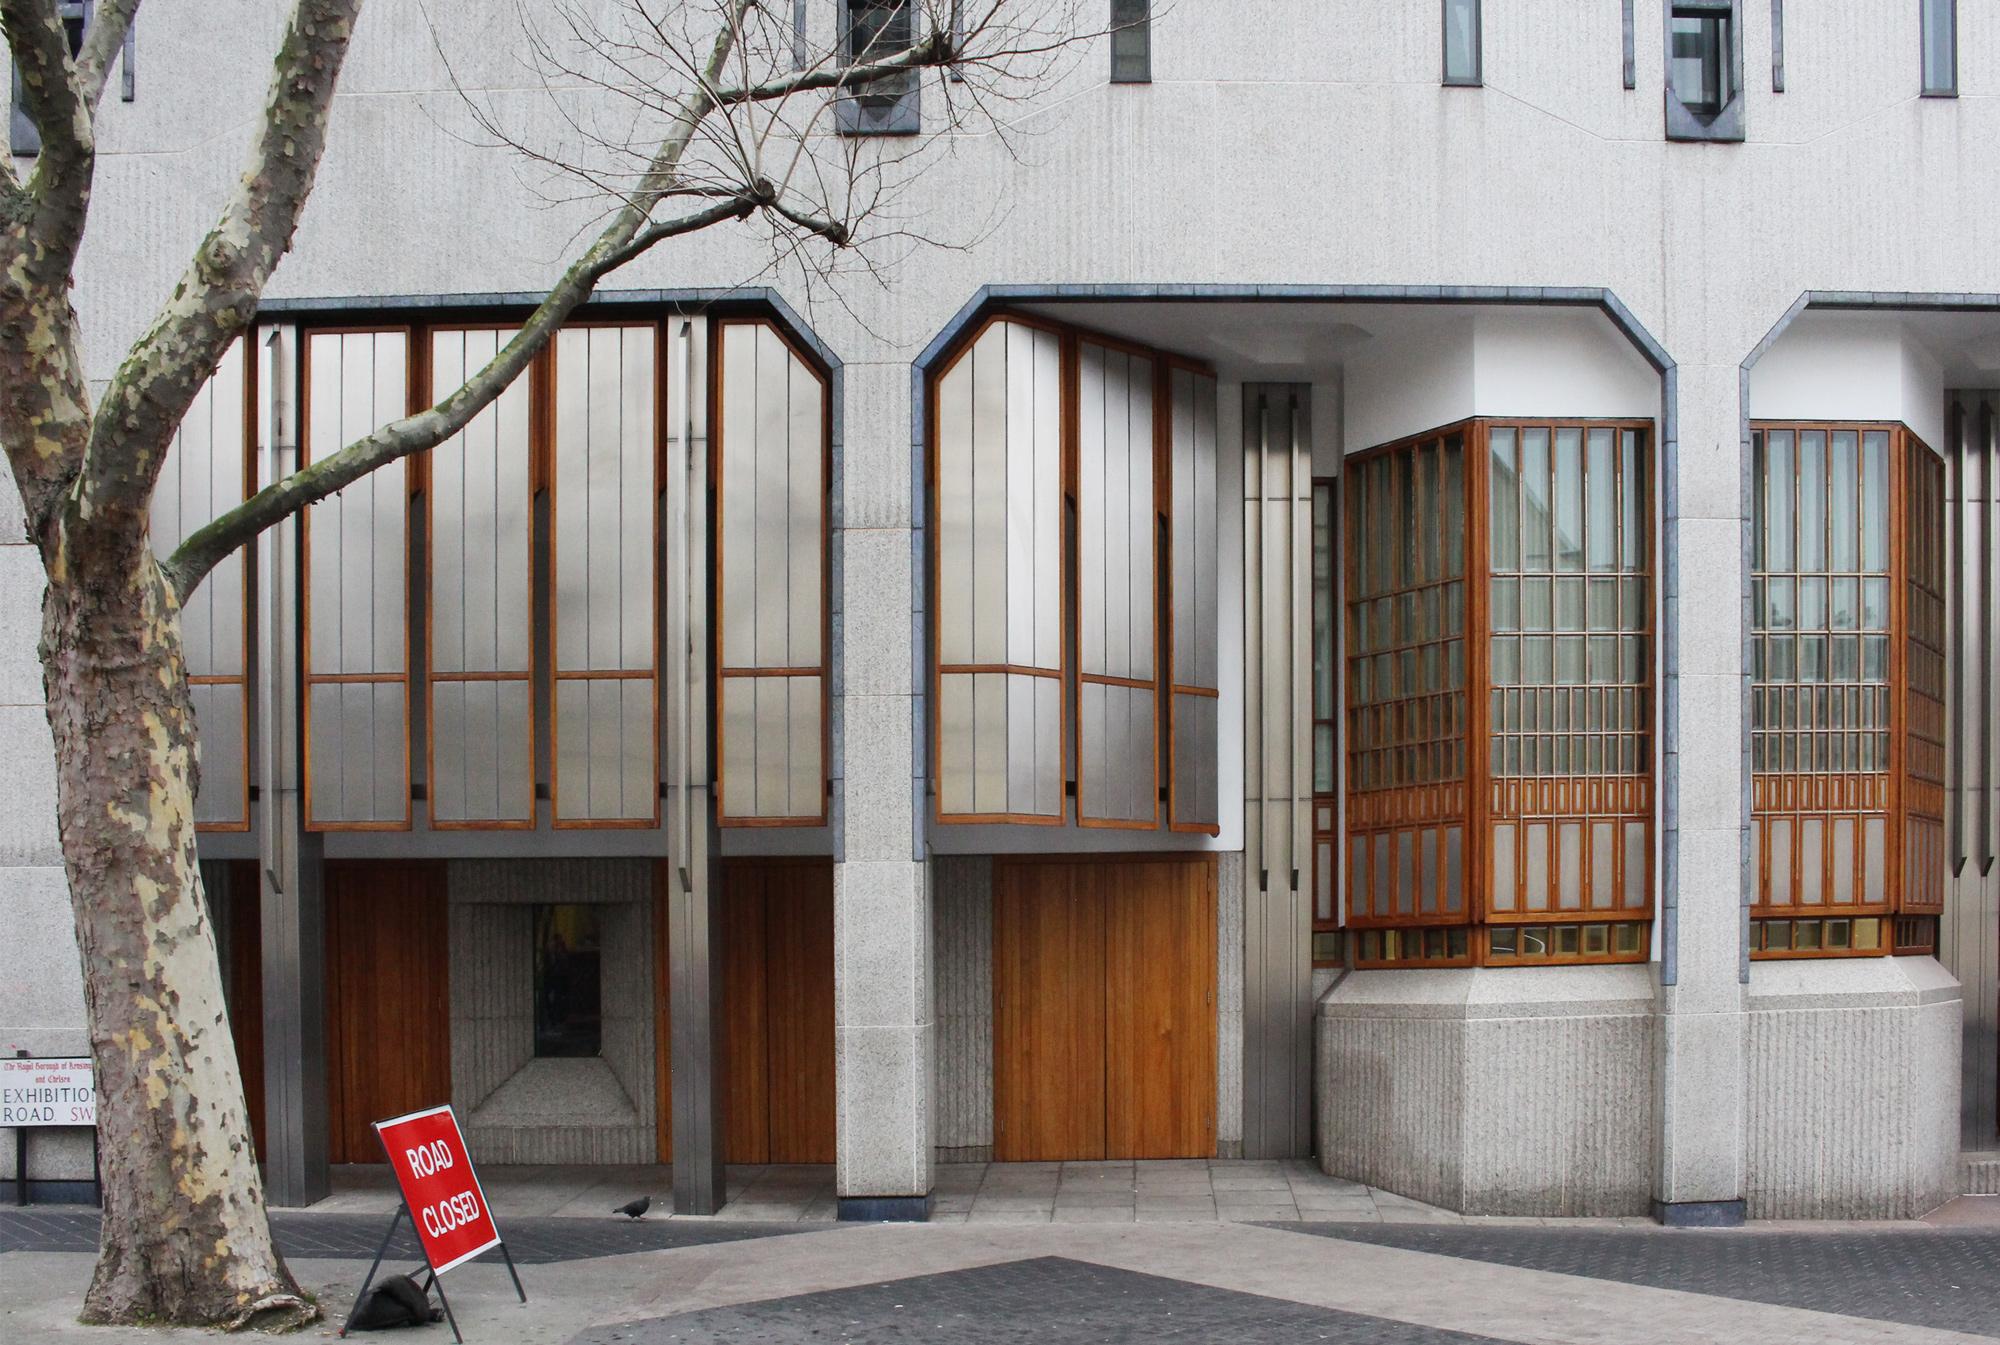 urbanbacklog-london-ismaili-center-3.jpg